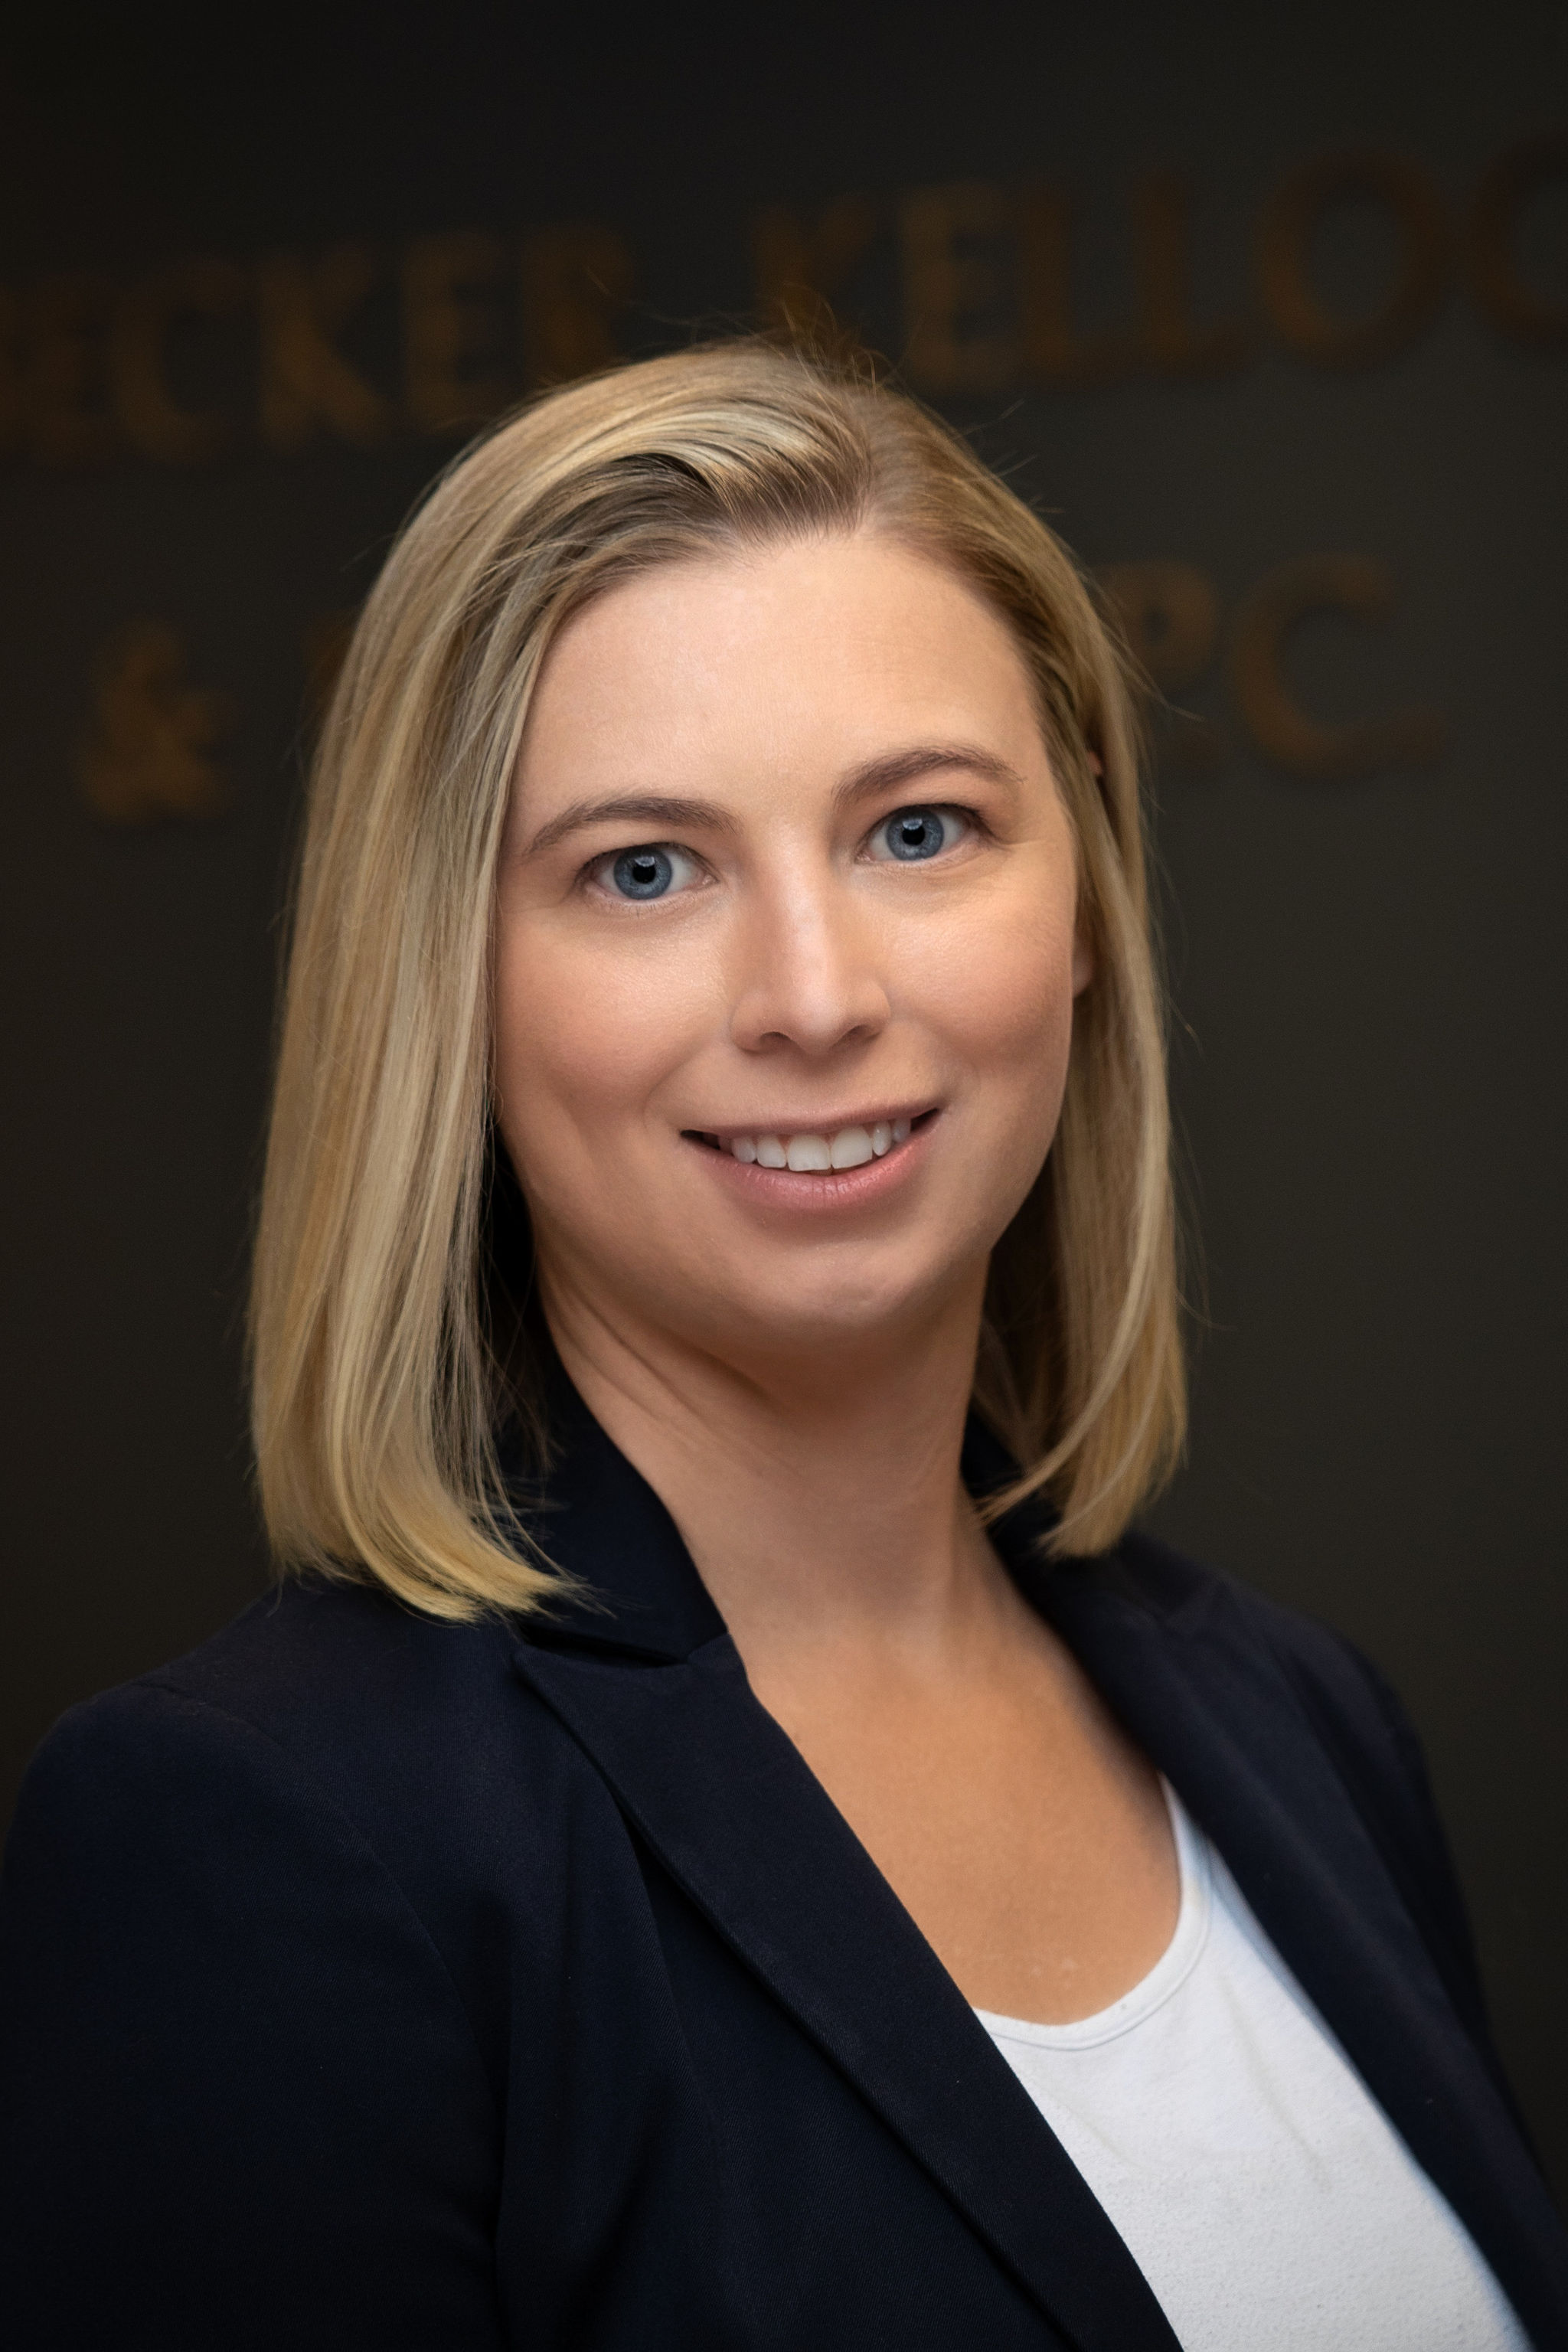 Megan Koster